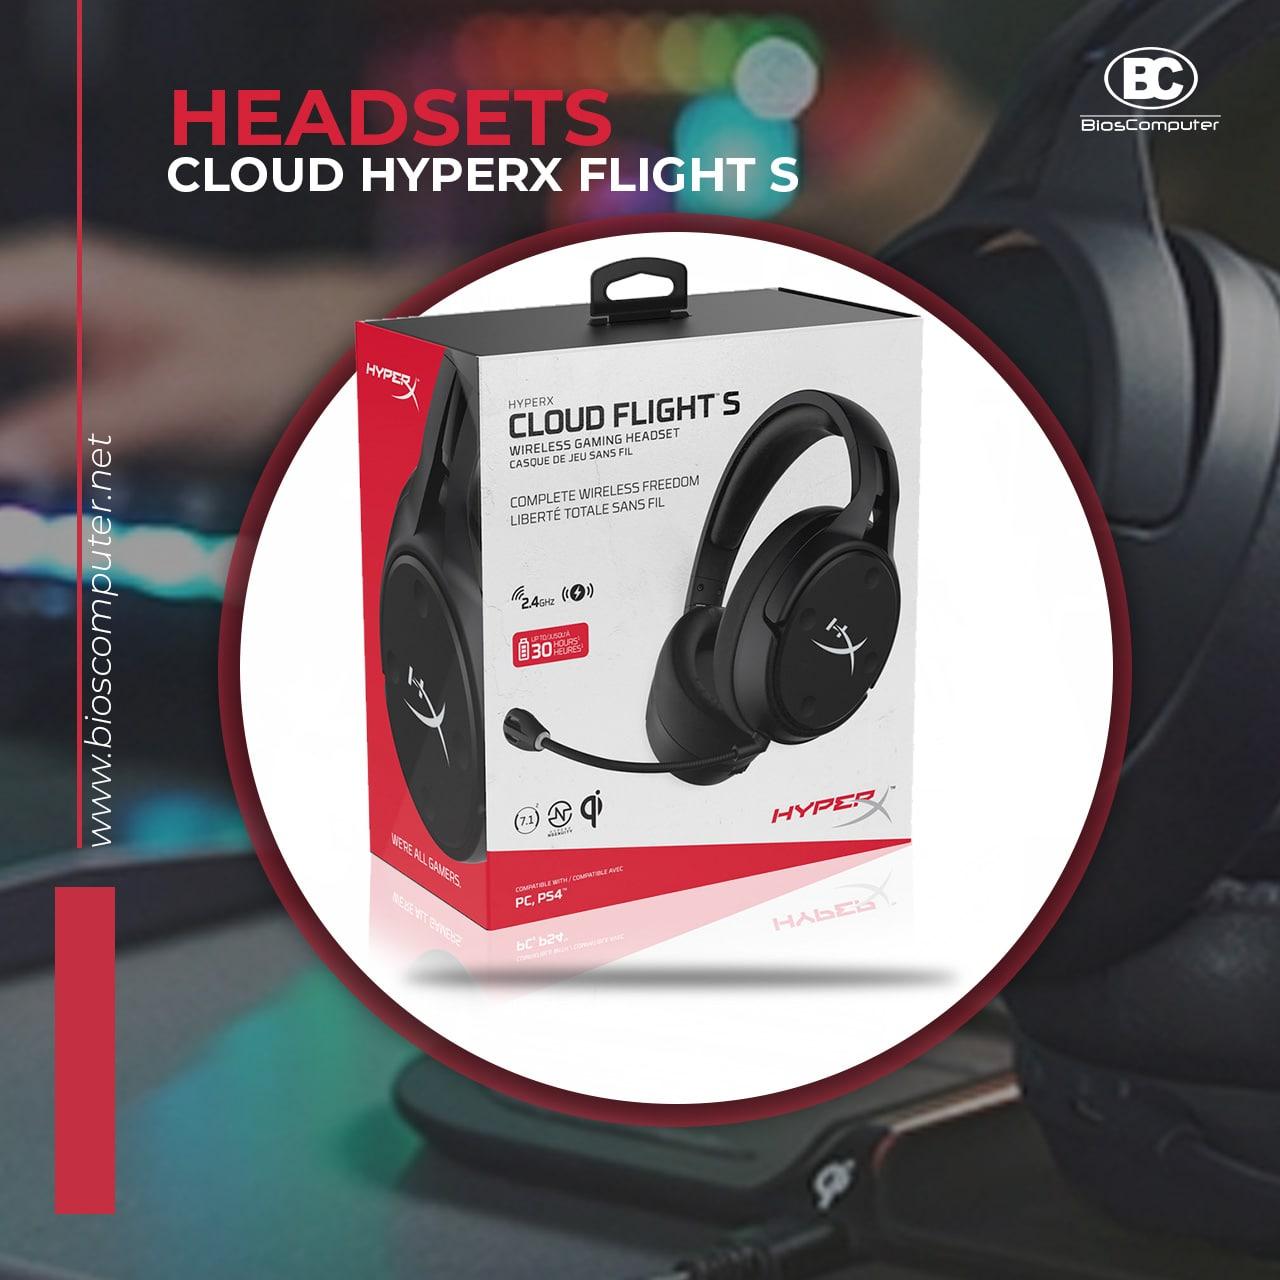 Headsets HyperX FlighS